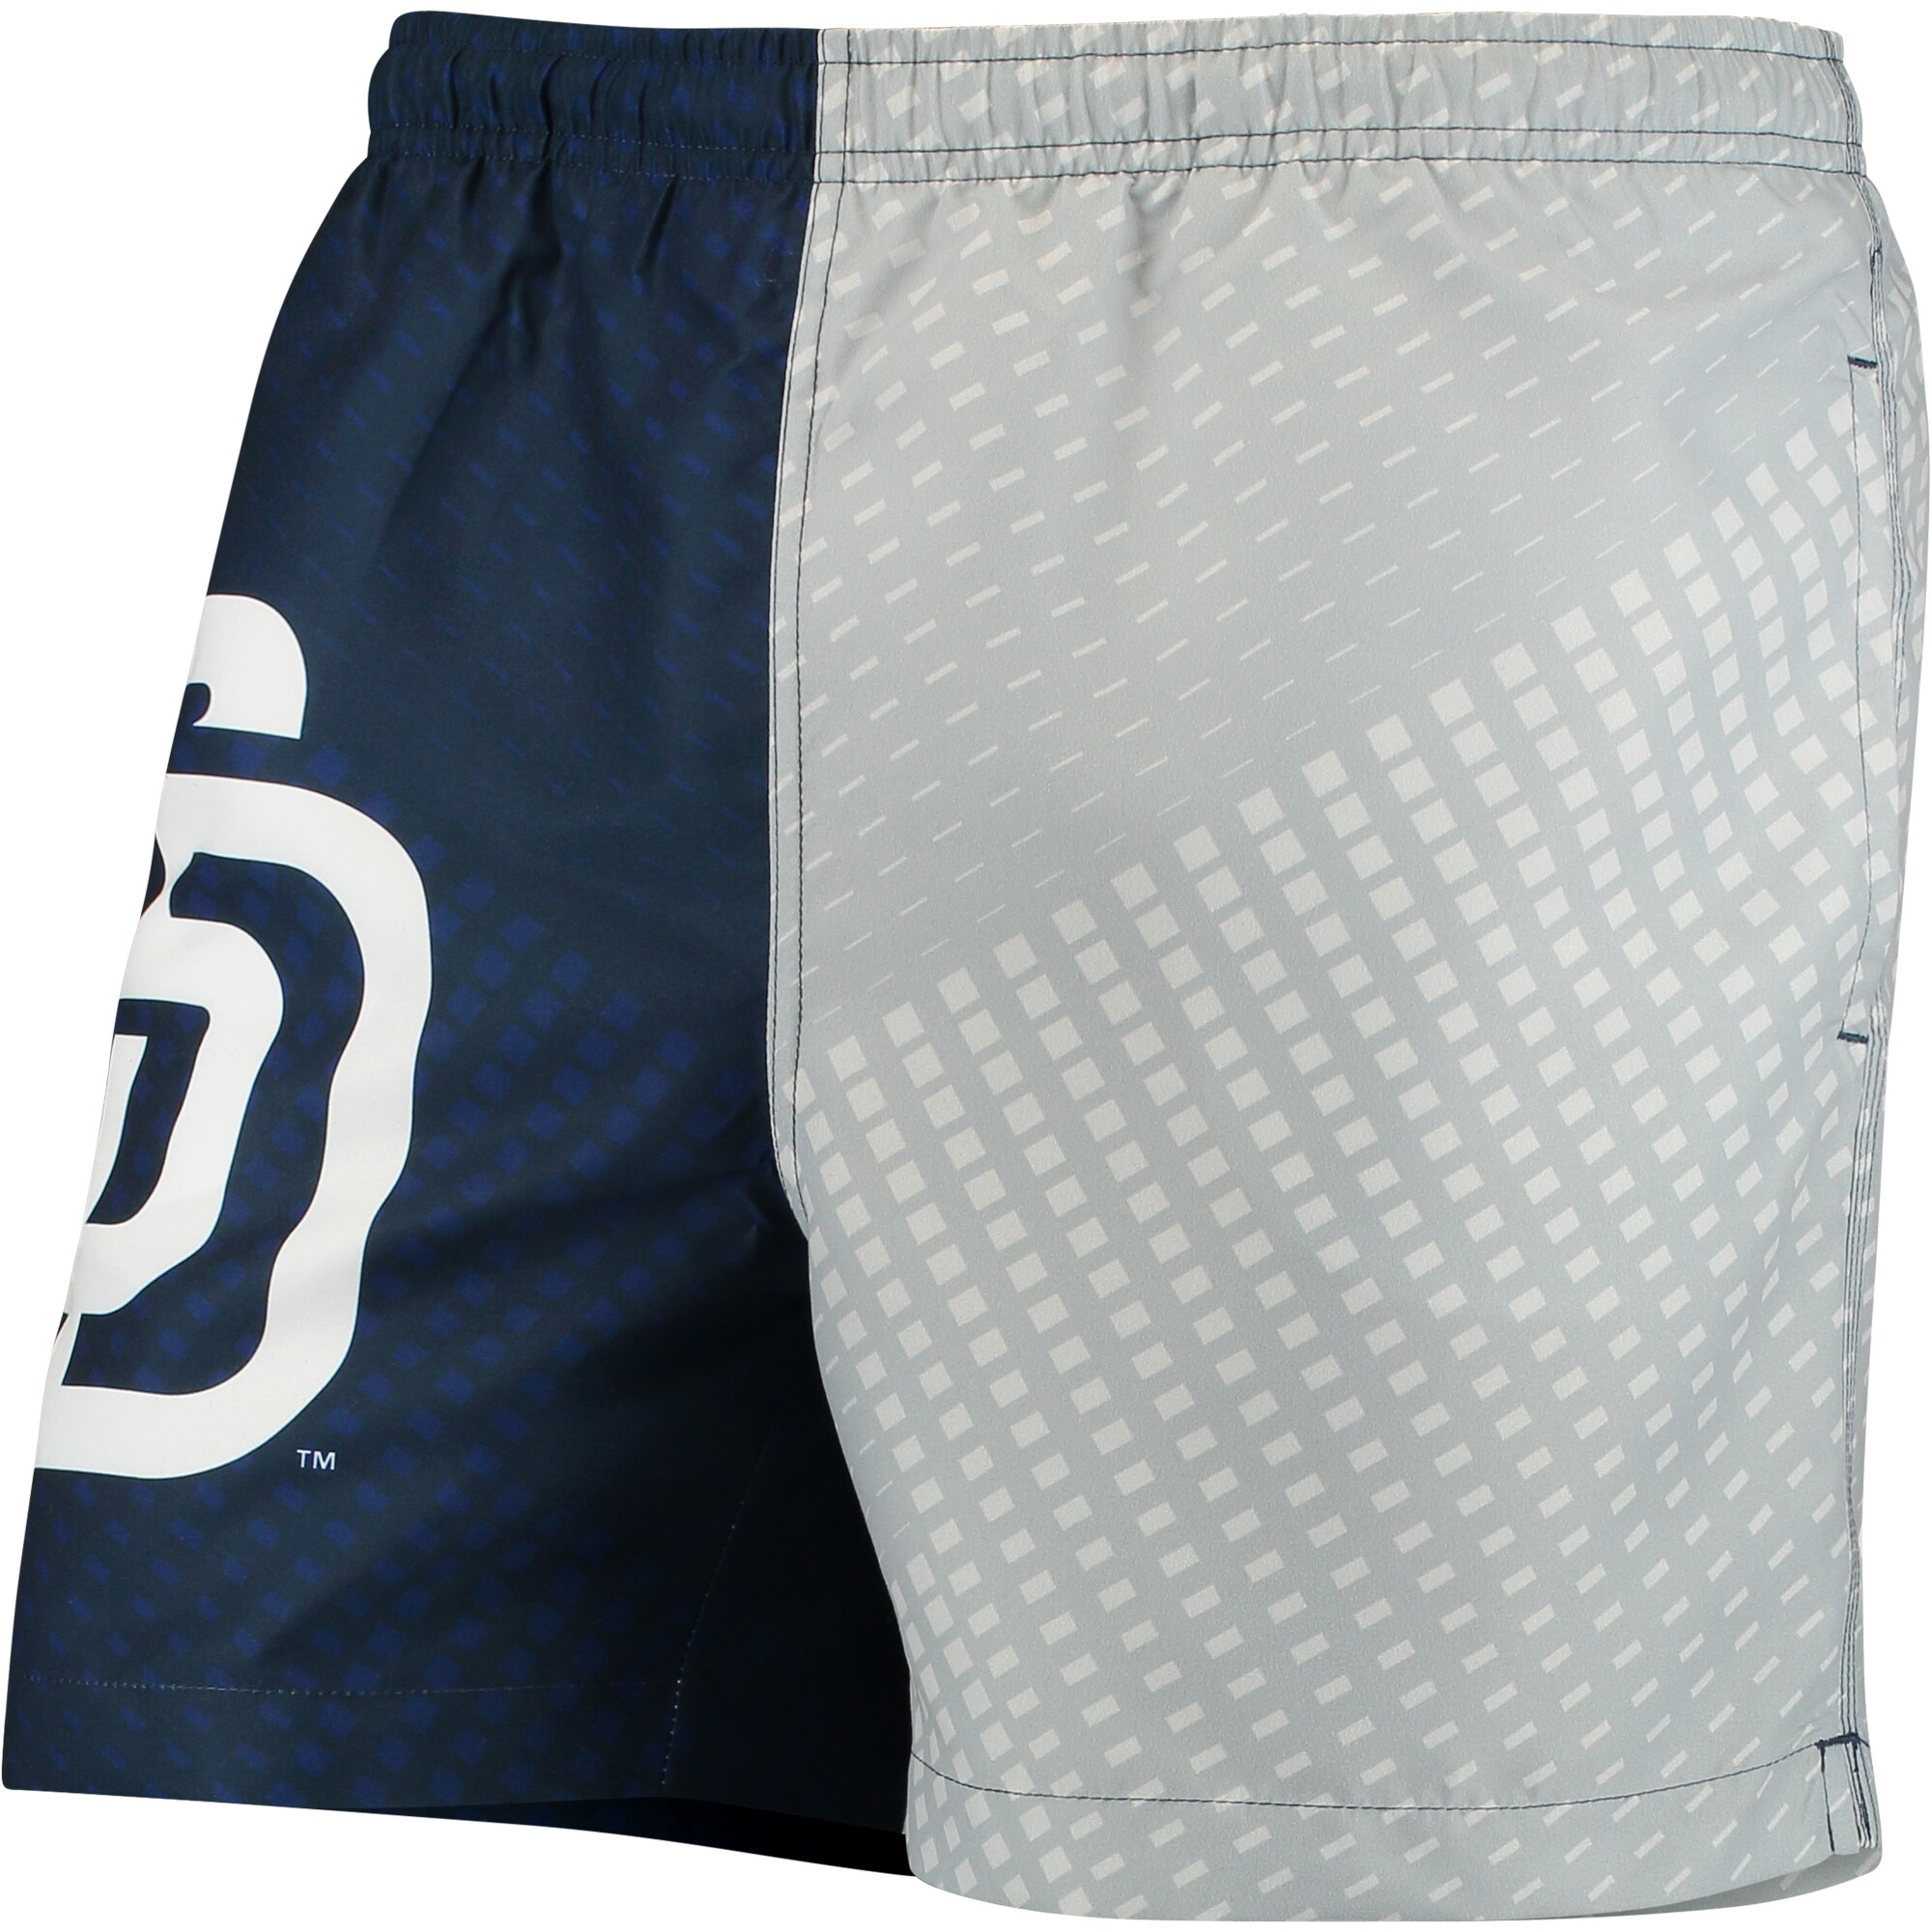 San Diego Padres Color Block Swim Trunks - Navy/Gray